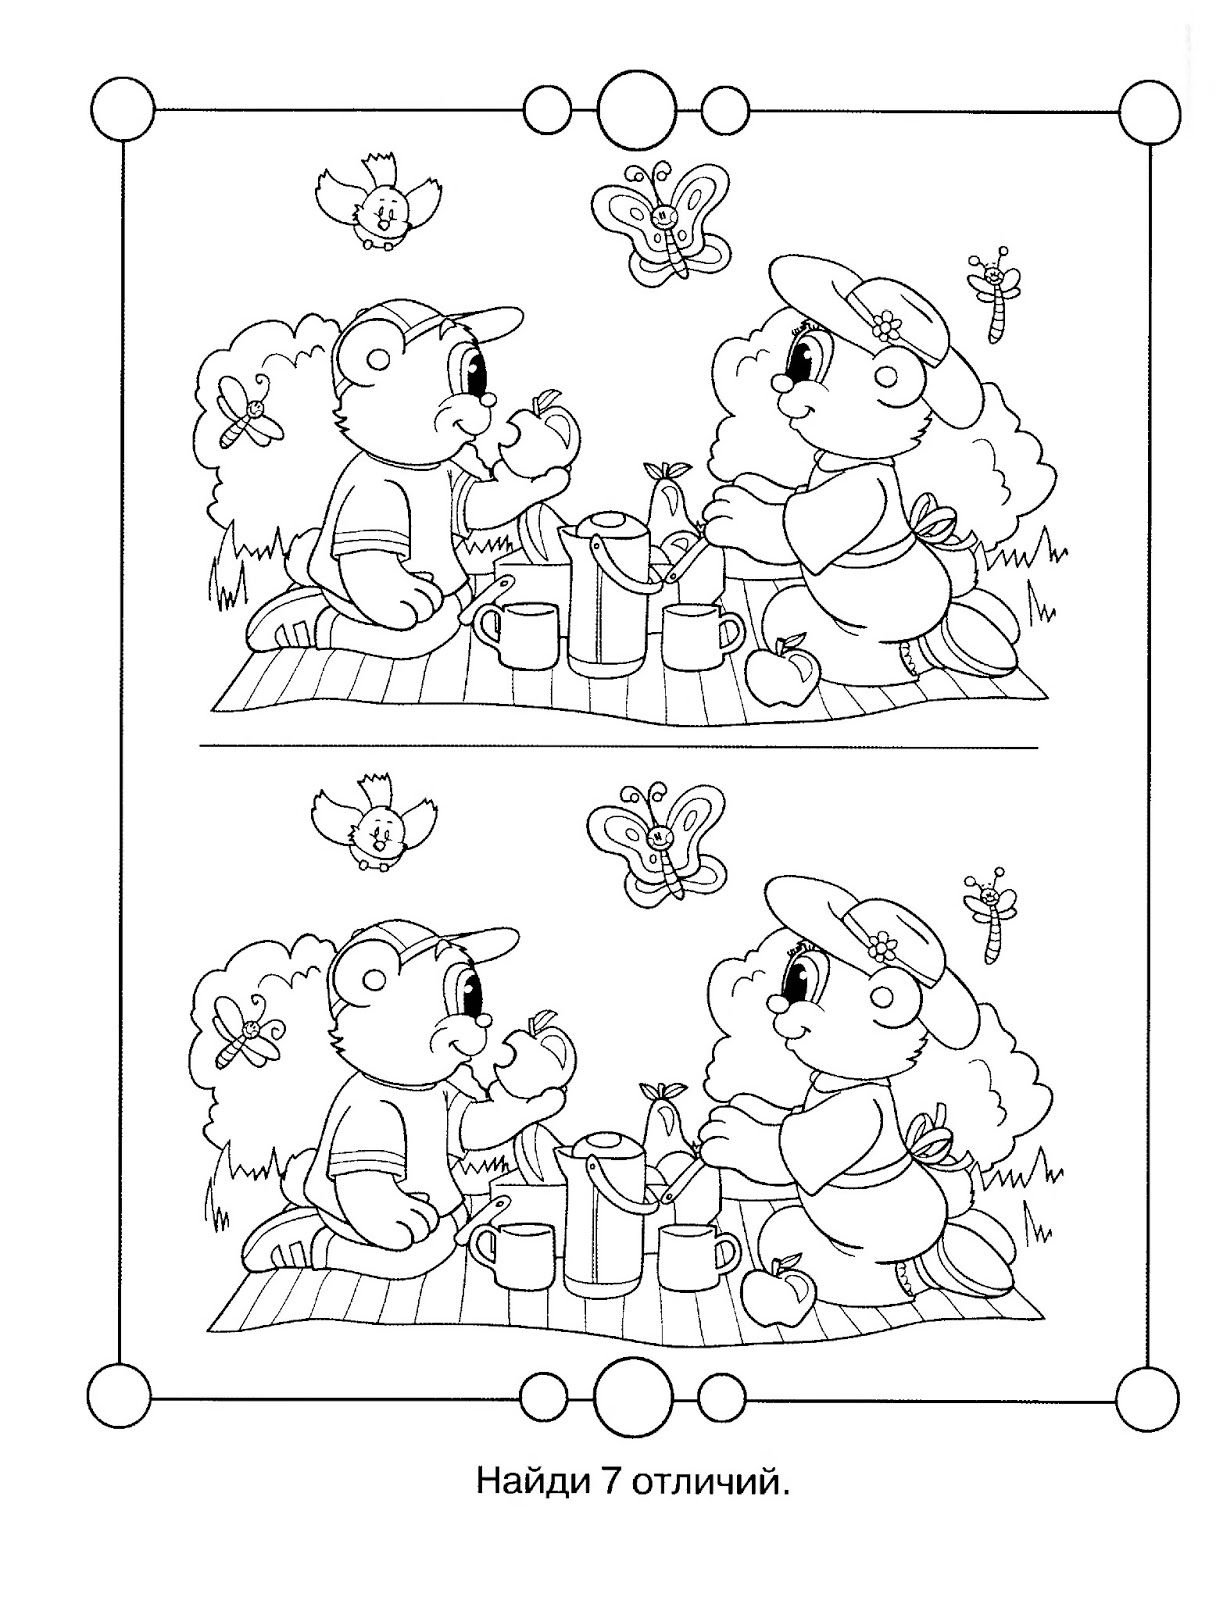 worksheet Rebus Puzzle Worksheets 7 rozdielov child development rebus puzzle gyerekeknek gyerekeknek